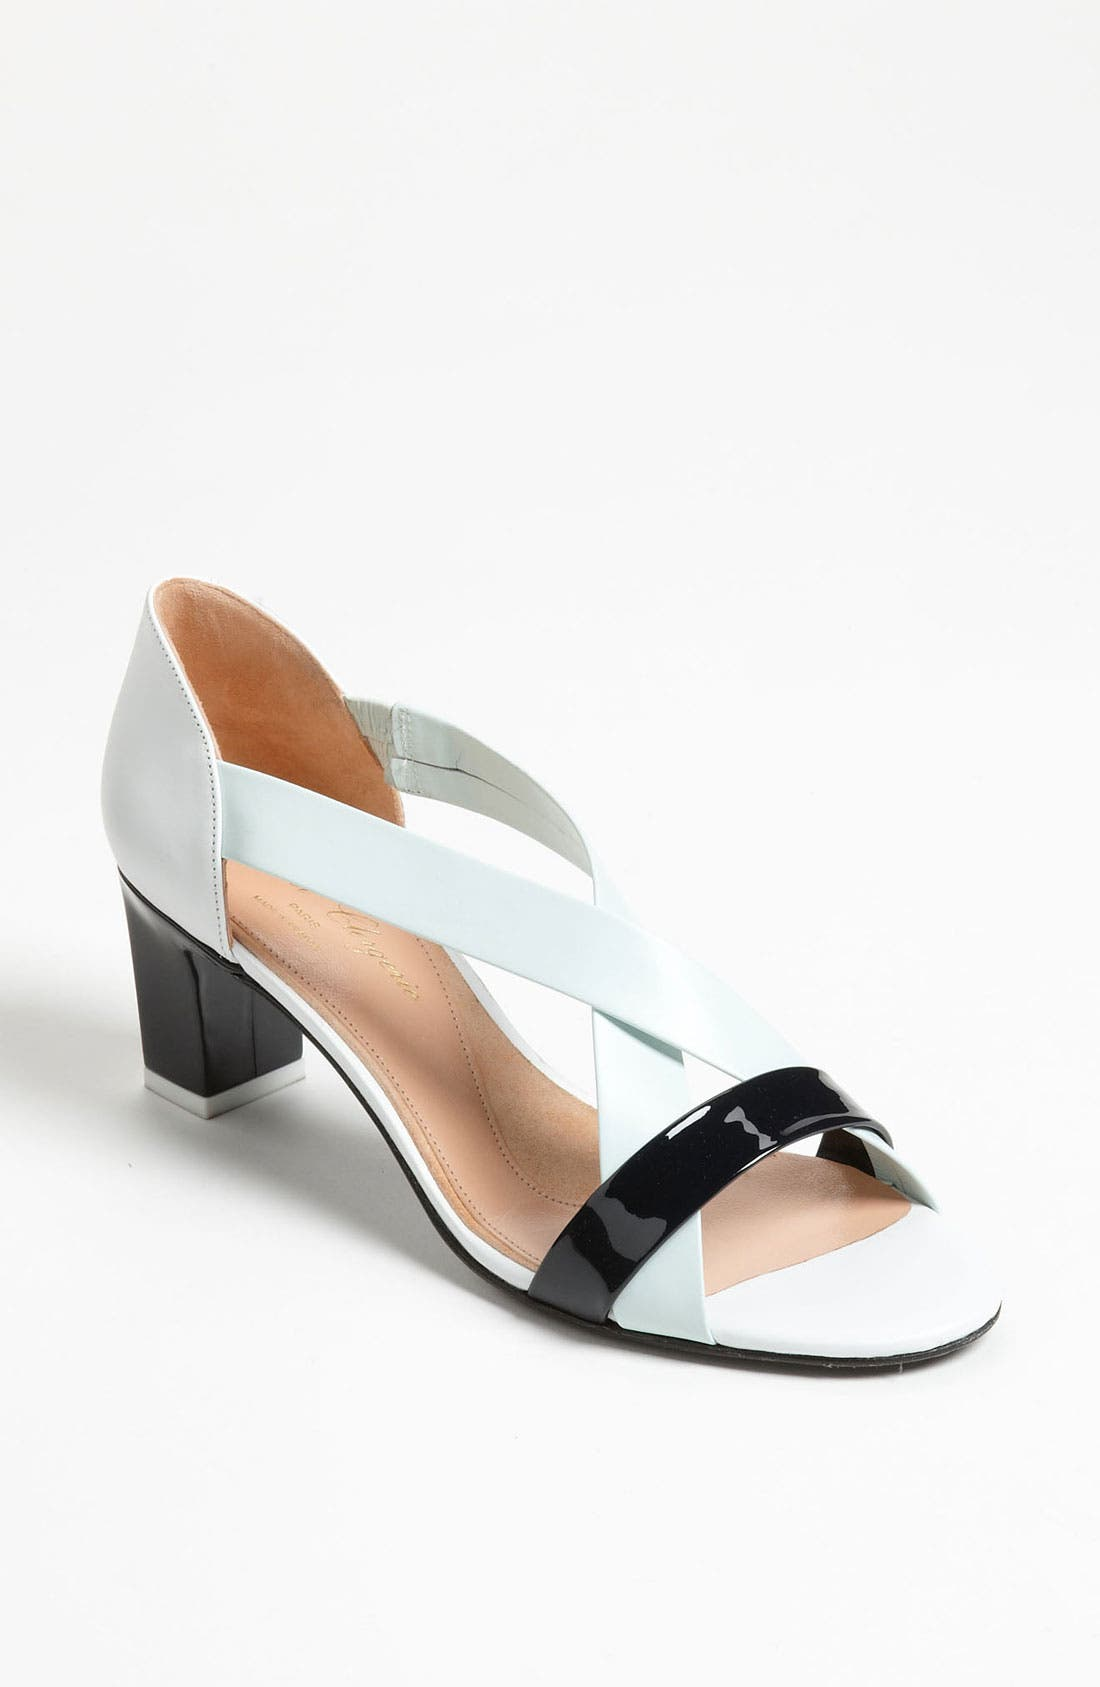 Main Image - Robert Clergerie 'Orano' Sandal